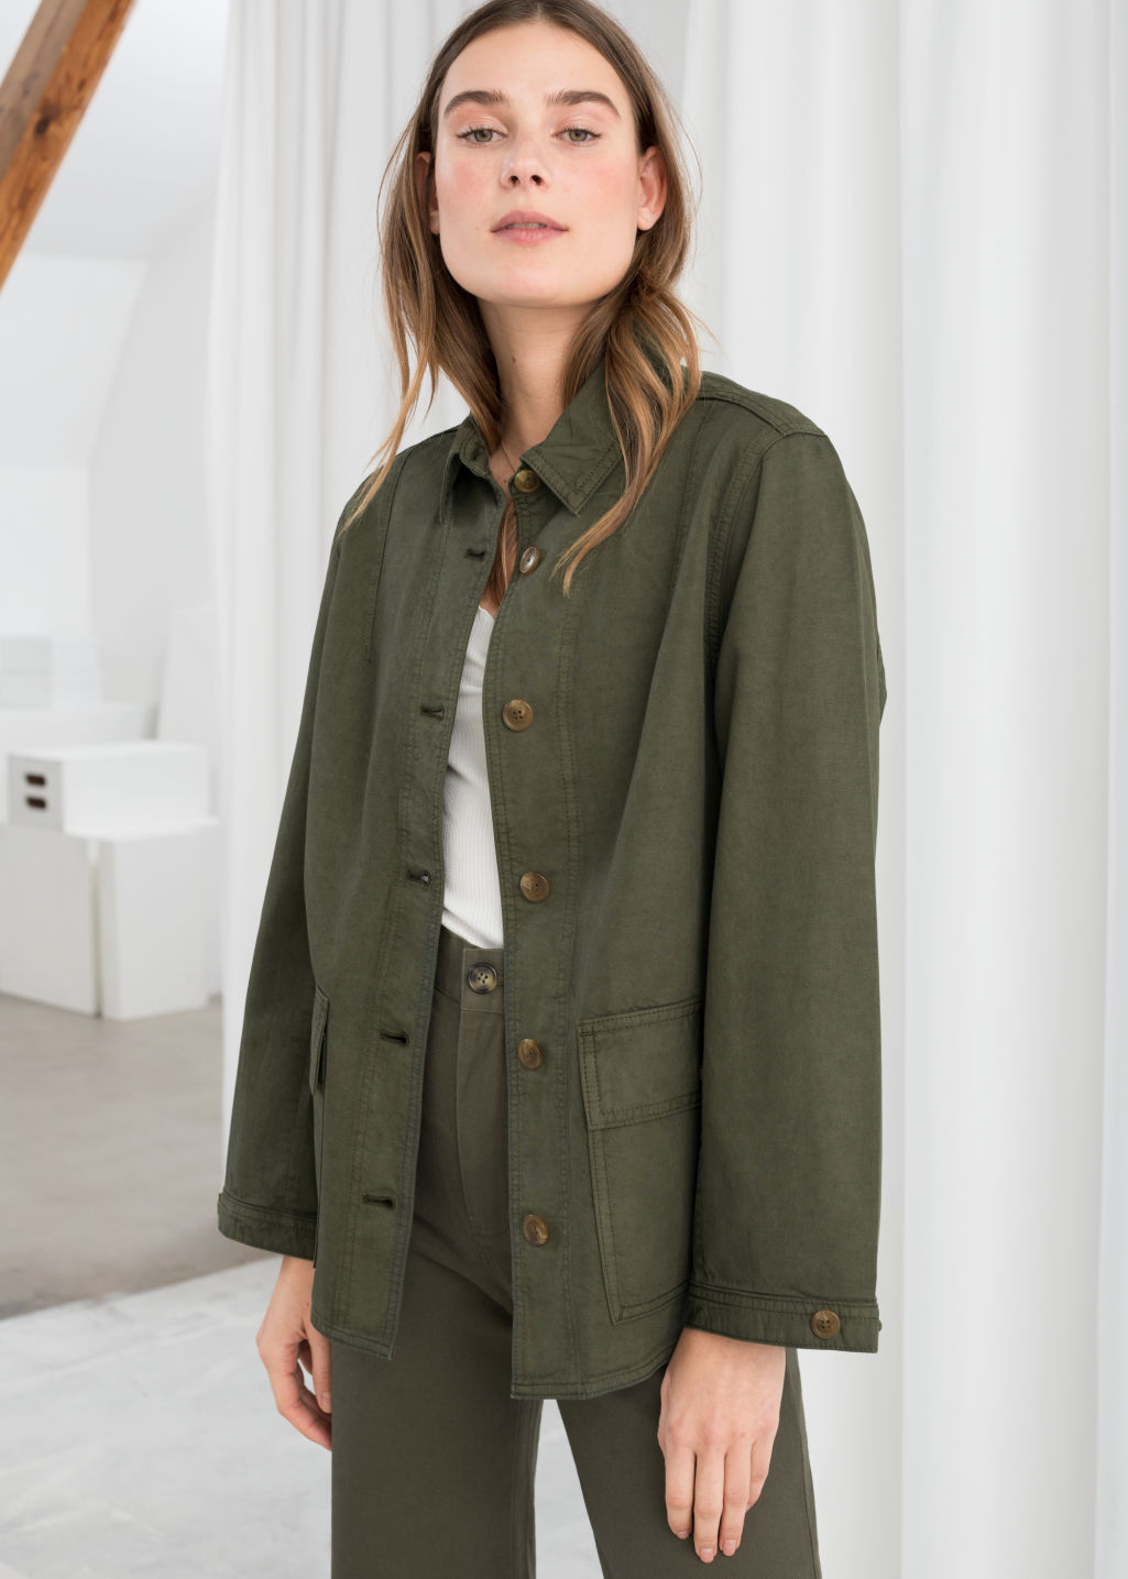 Khaki Jacket Jacketsamp; Other Denim Workwear Organic Cotton pLGSMVqUz